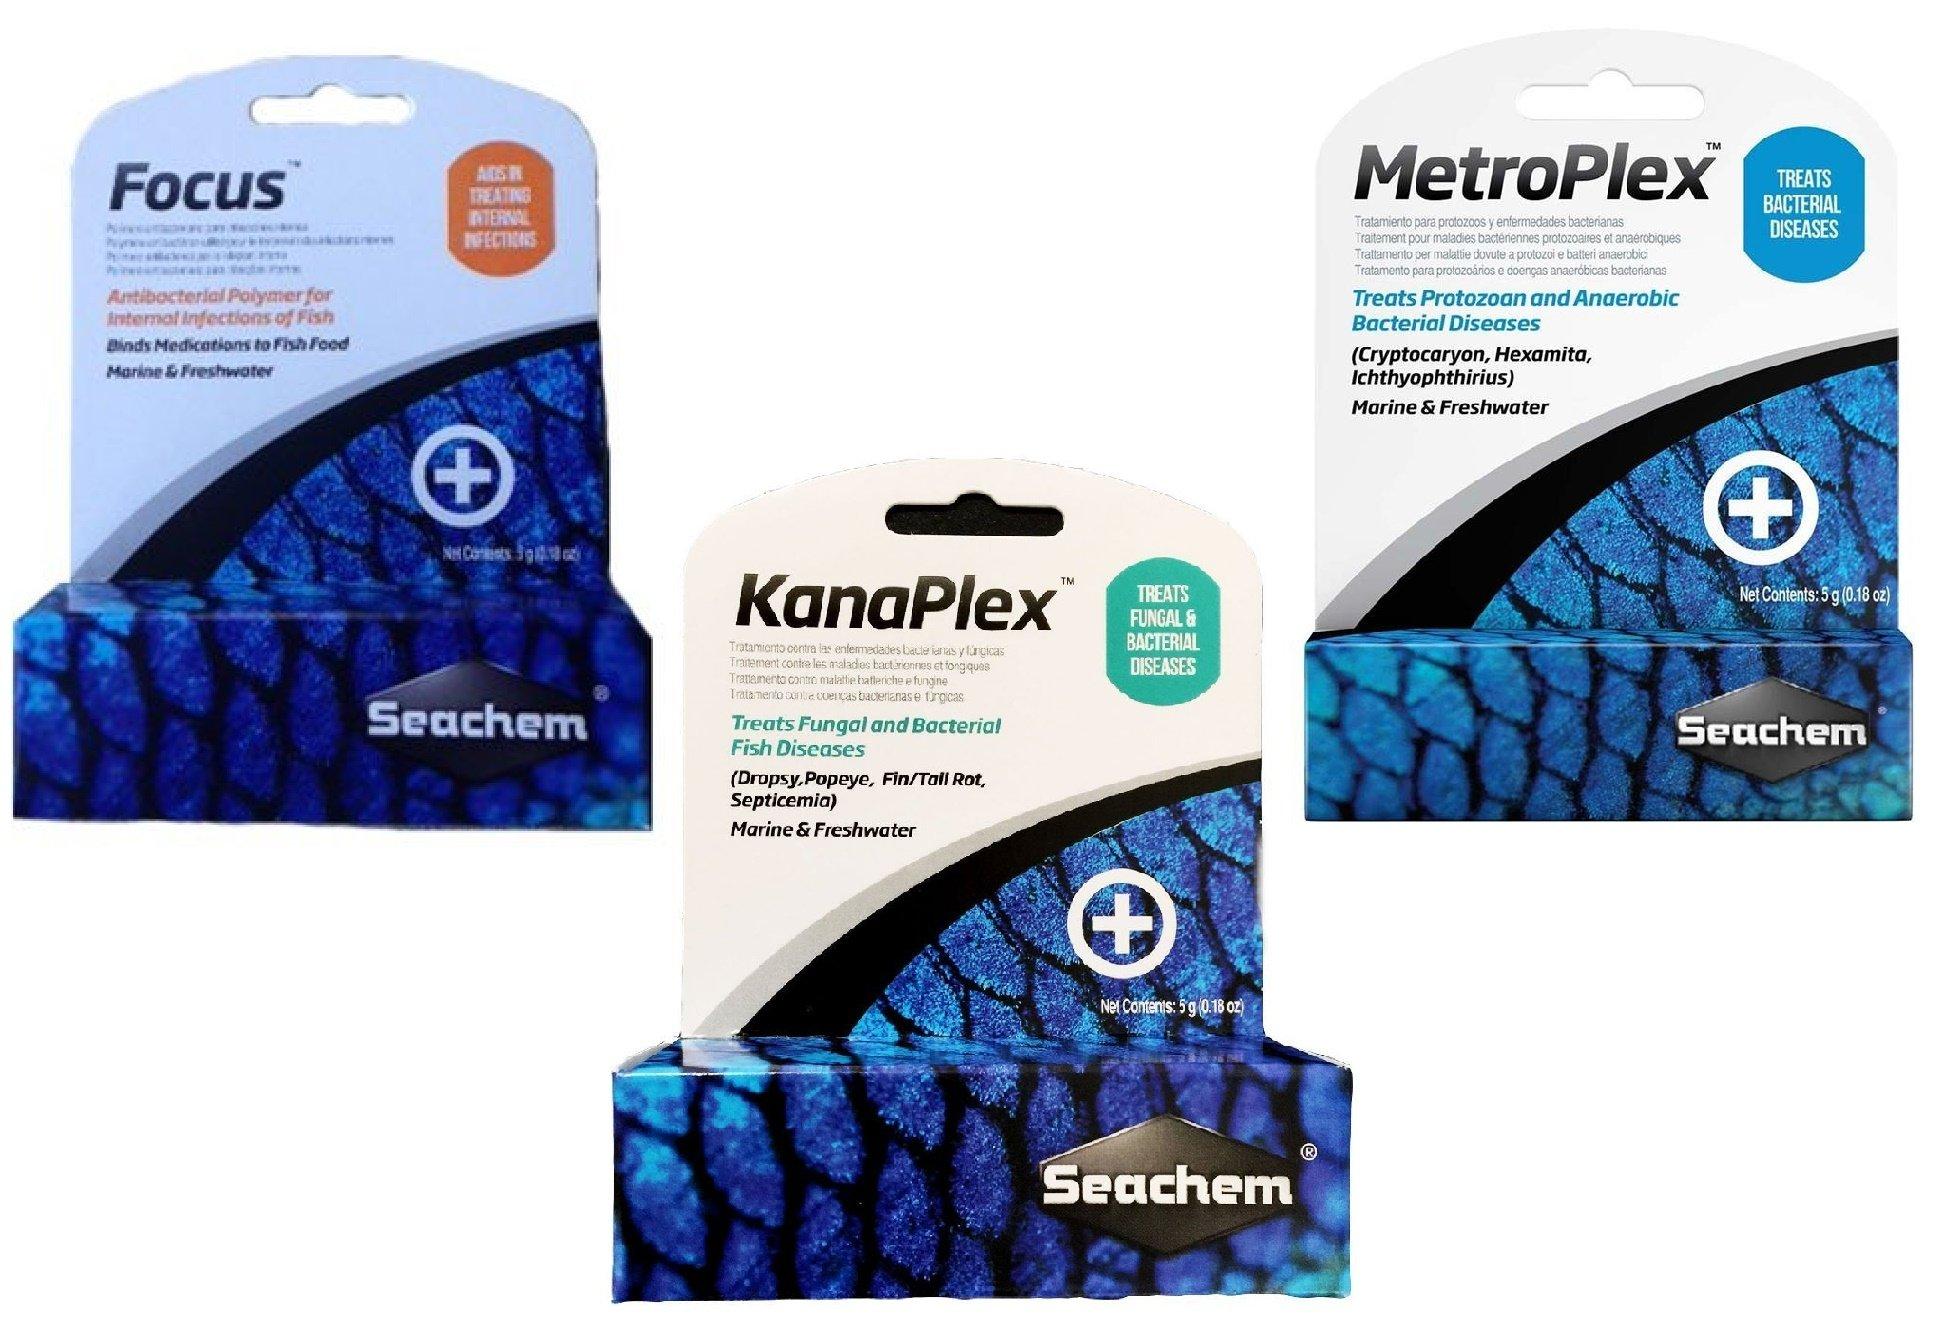 Seachem 3 Piece Treatment Kit, 1-Focus, 1-Metroplex, and 1-Kanaplex (5 Grams Each) by Seachem